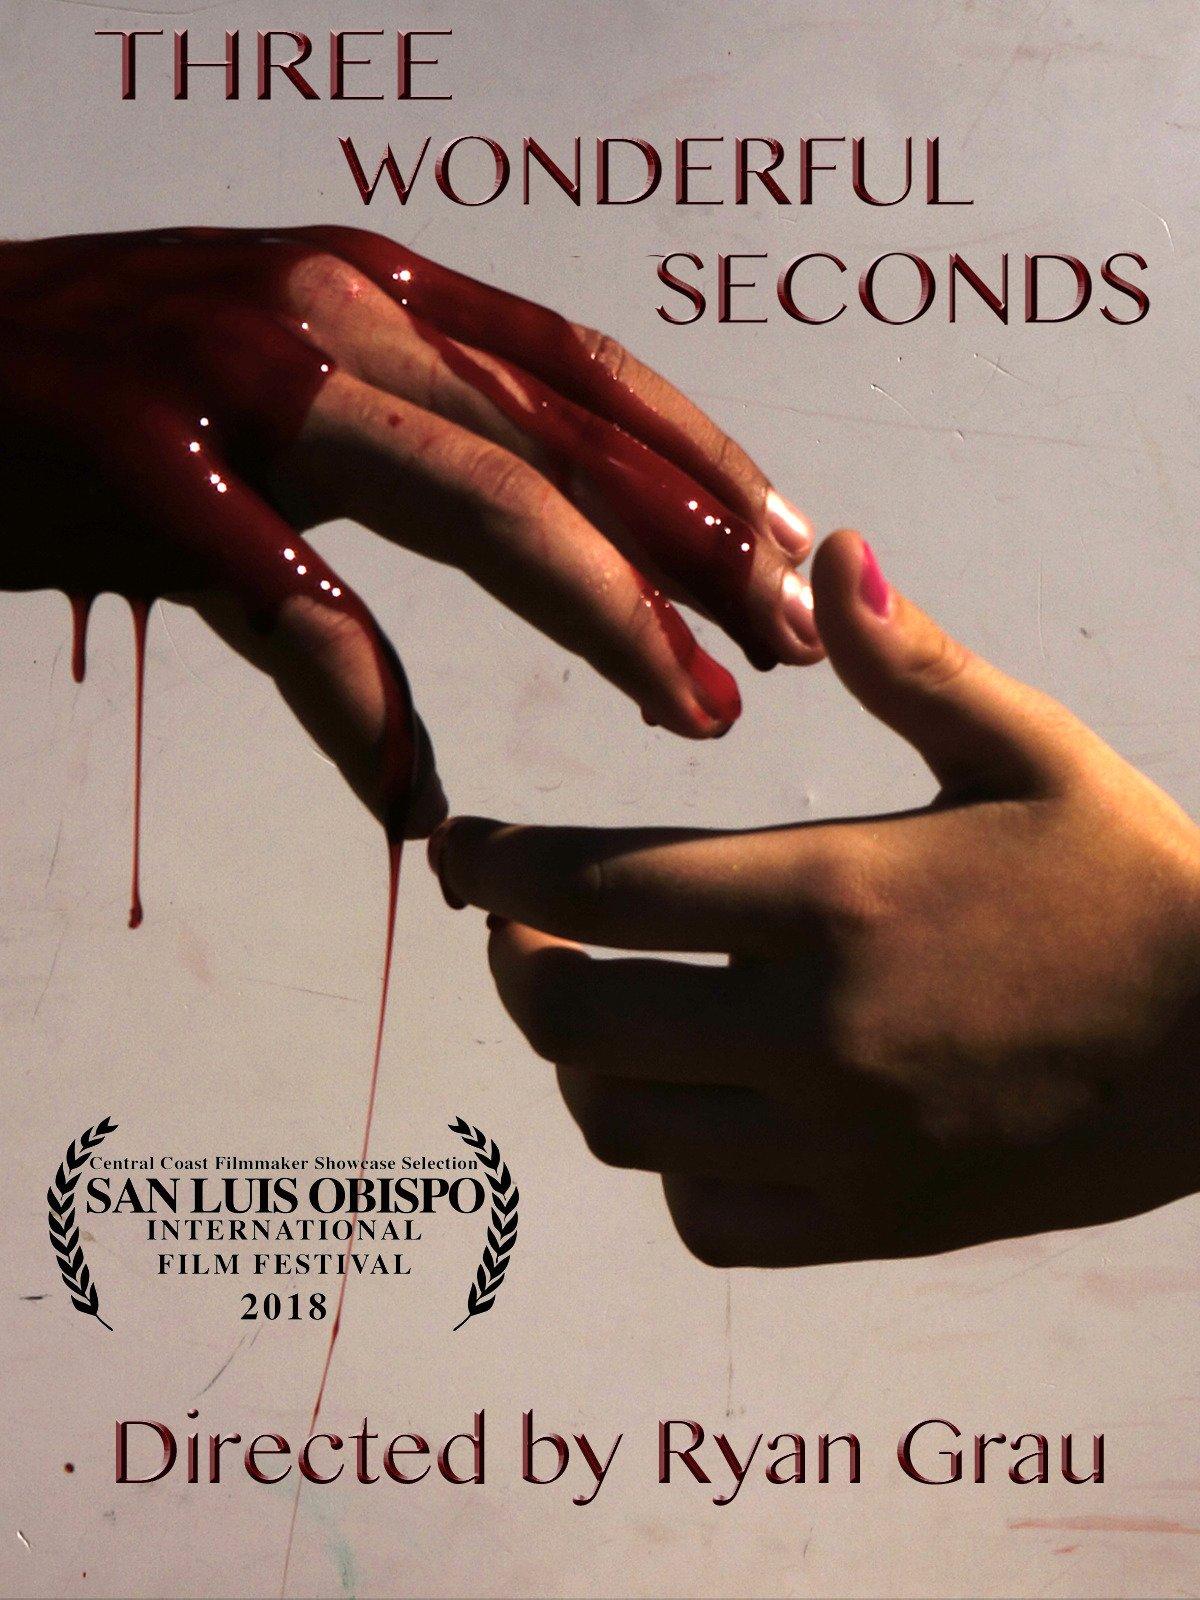 Three Wonderful Seconds